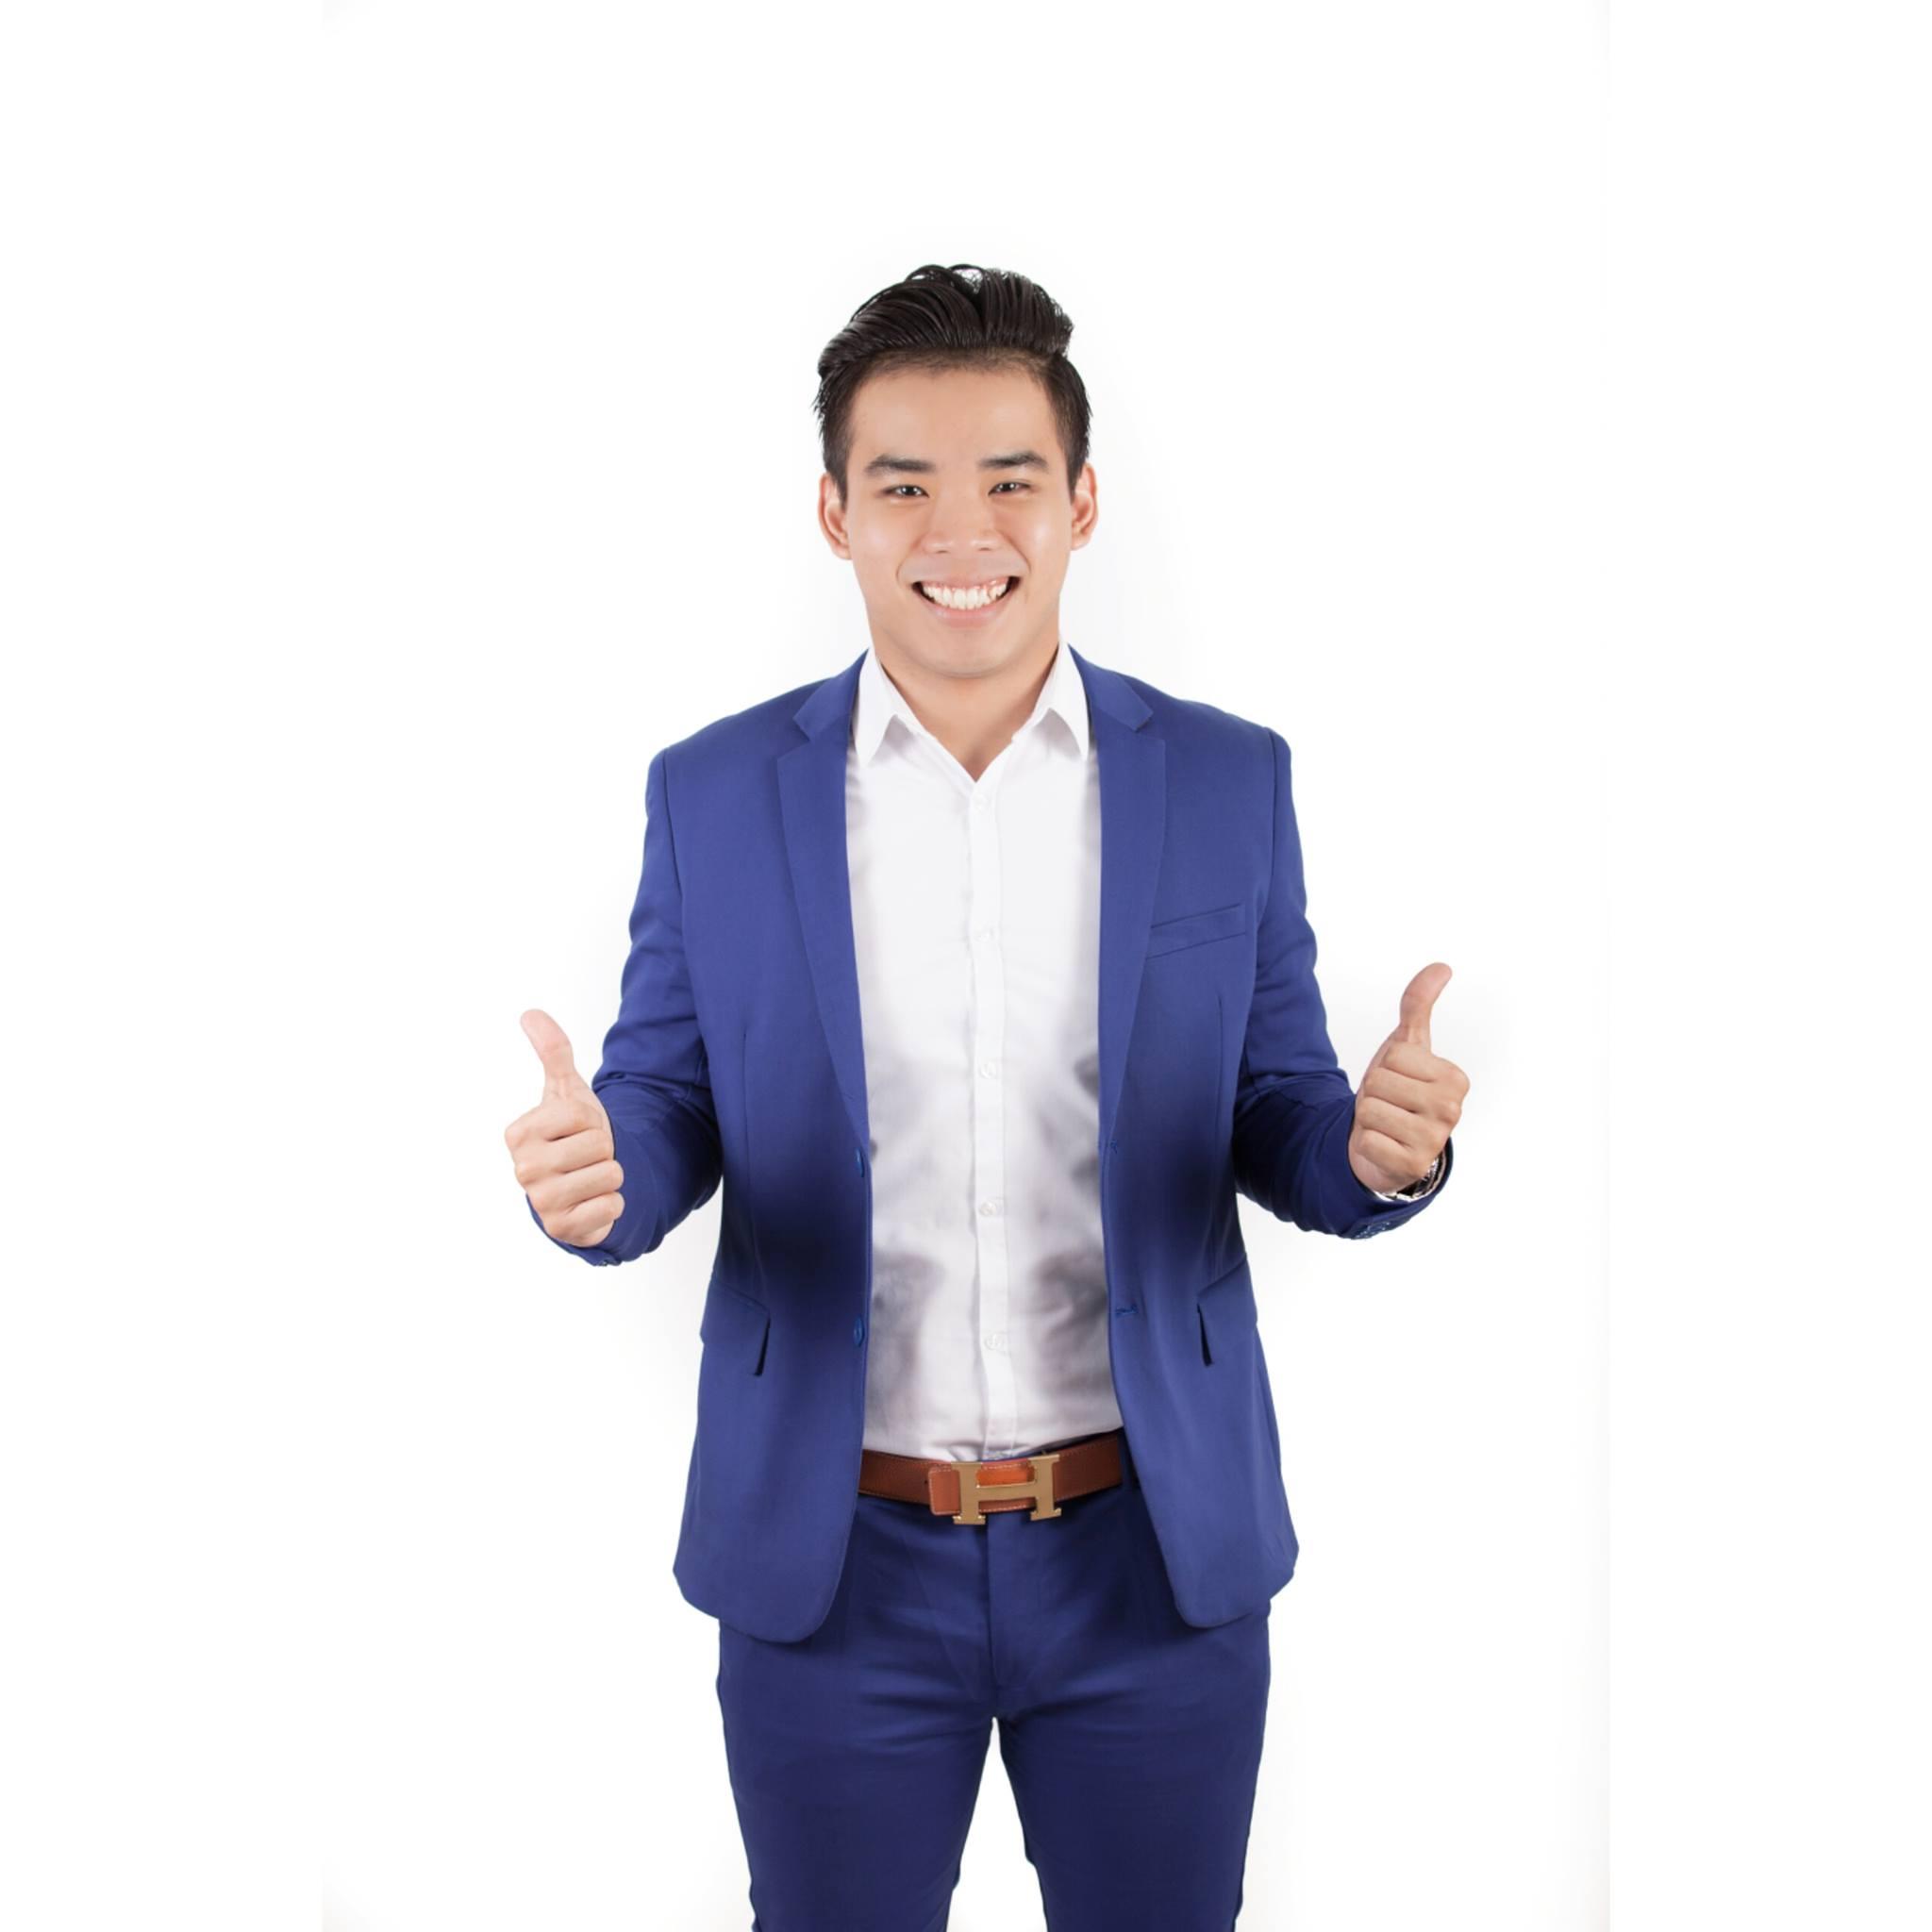 Finance Expert Darren C. on his Achievements and Future plans